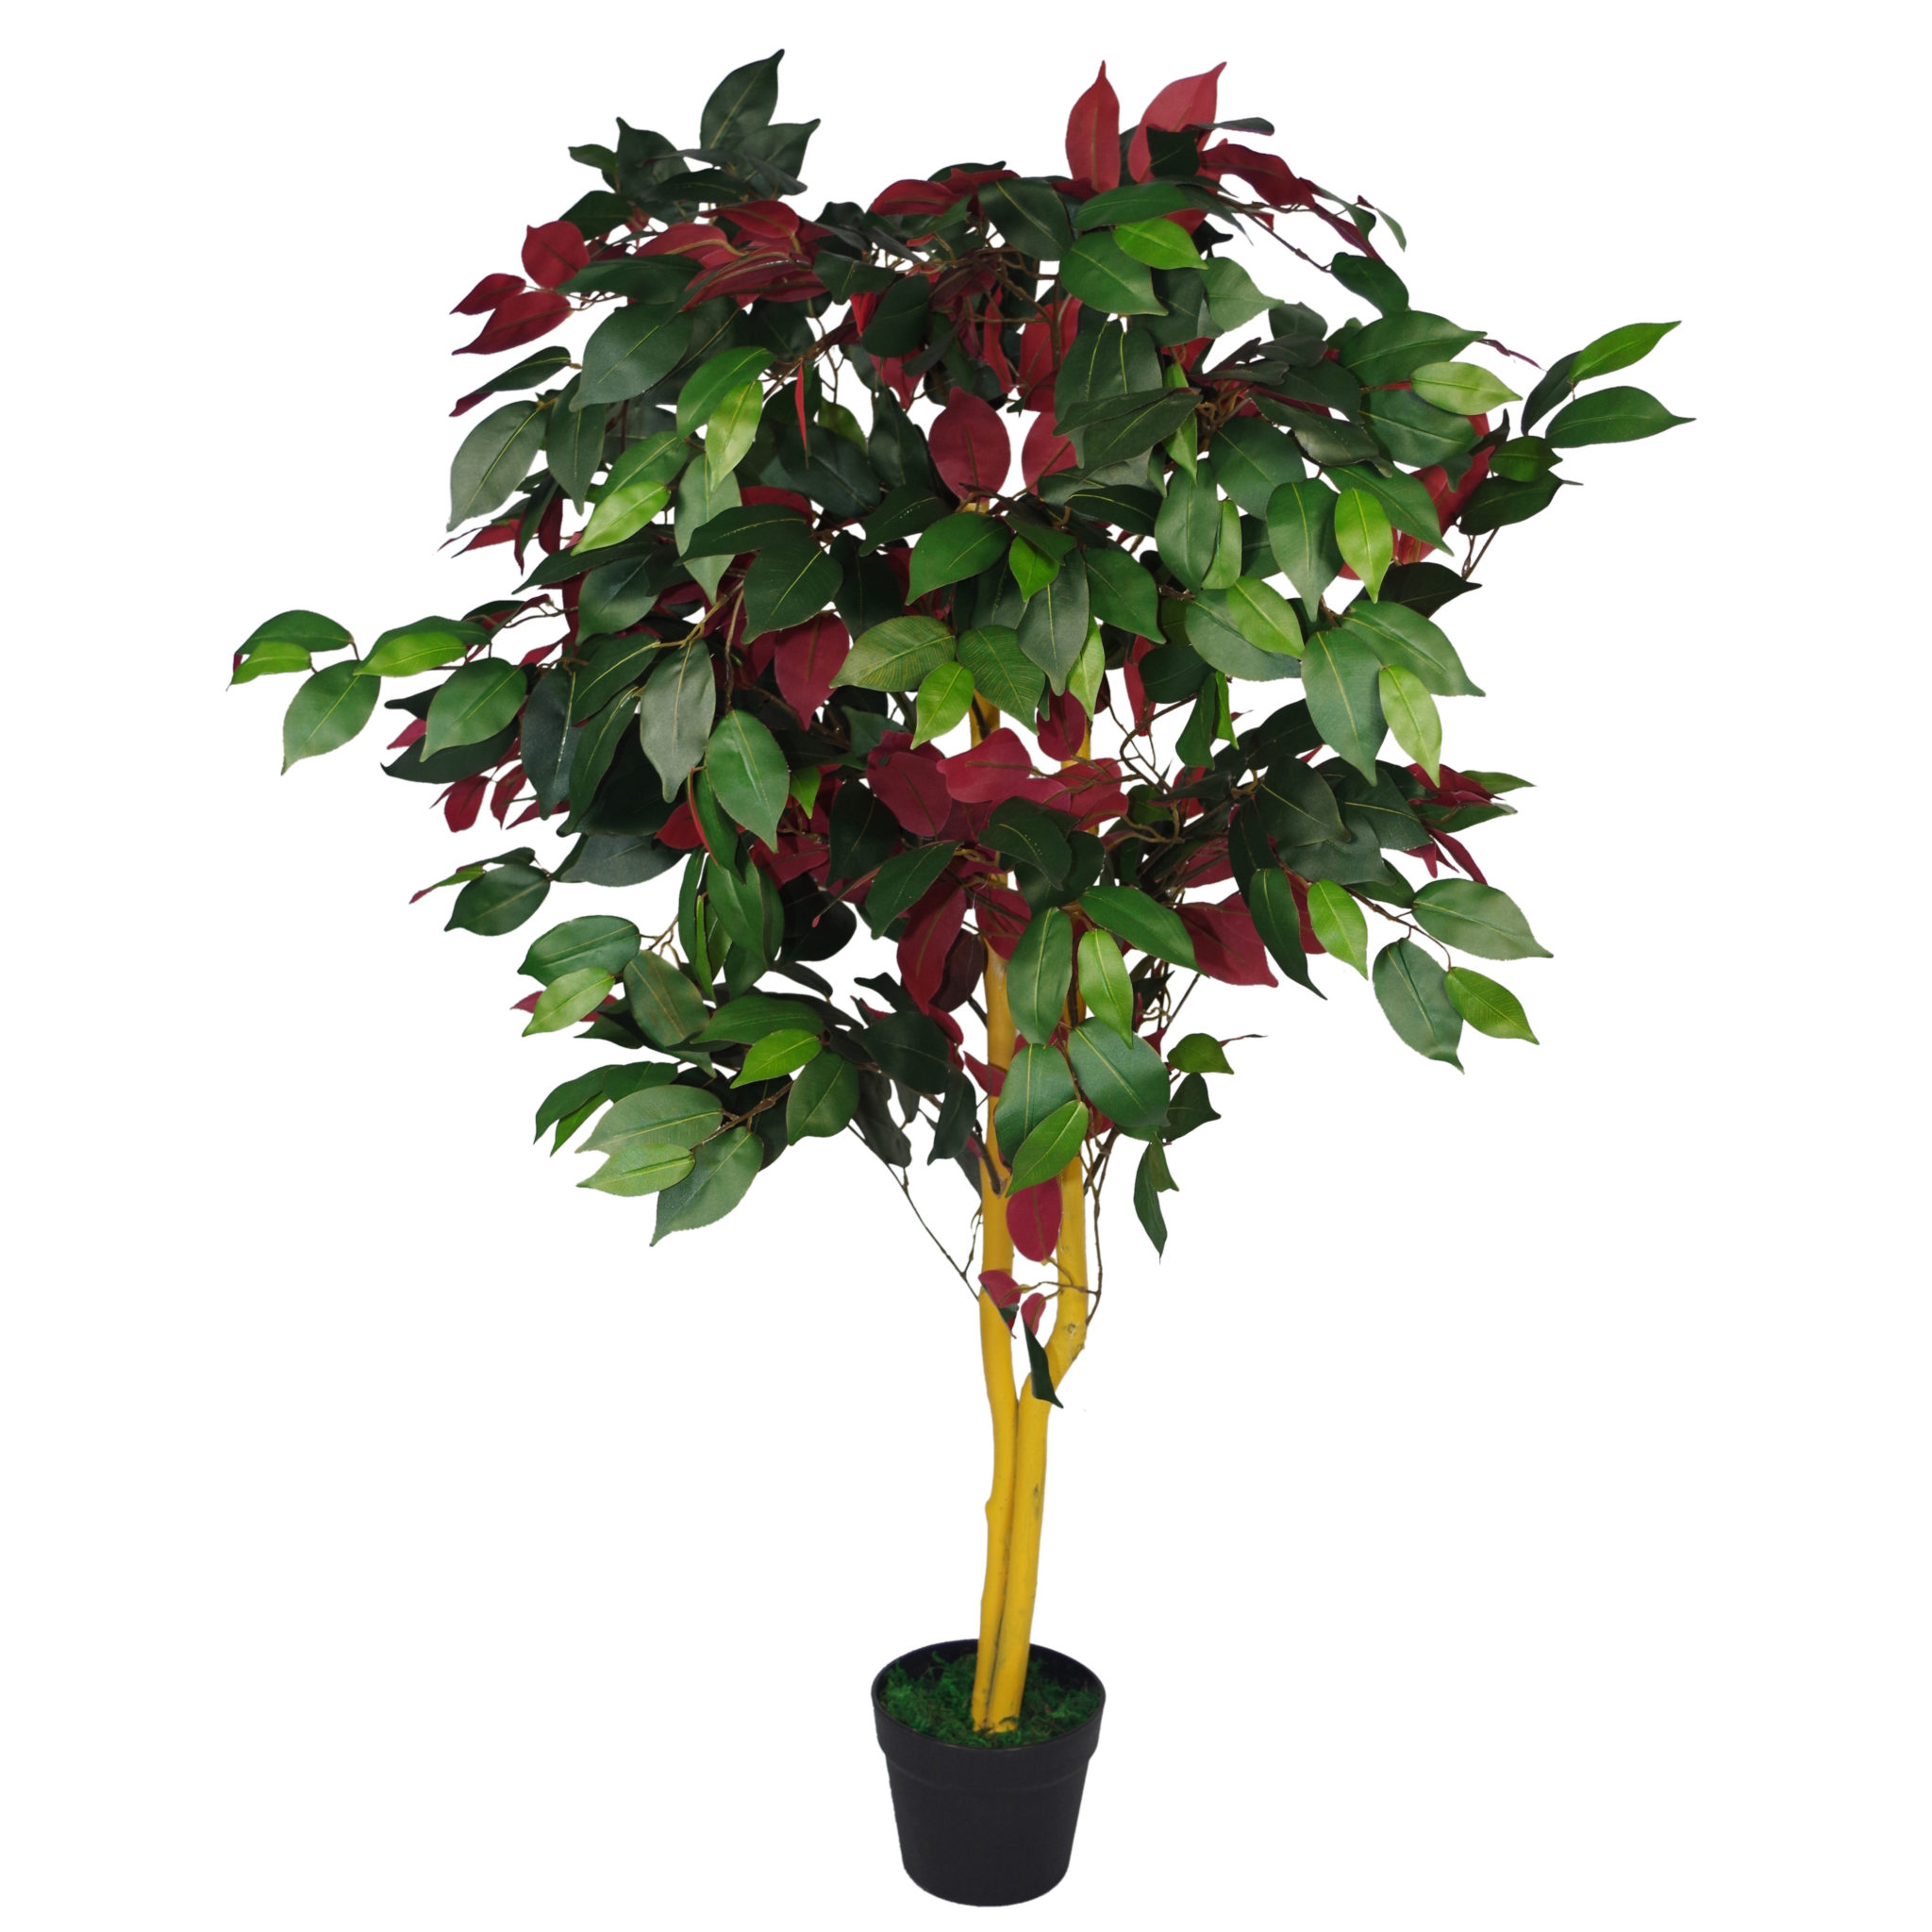 Artificial Trees Plants: 120cm (4ft) Artificial Capensia Tree Ficus Plant